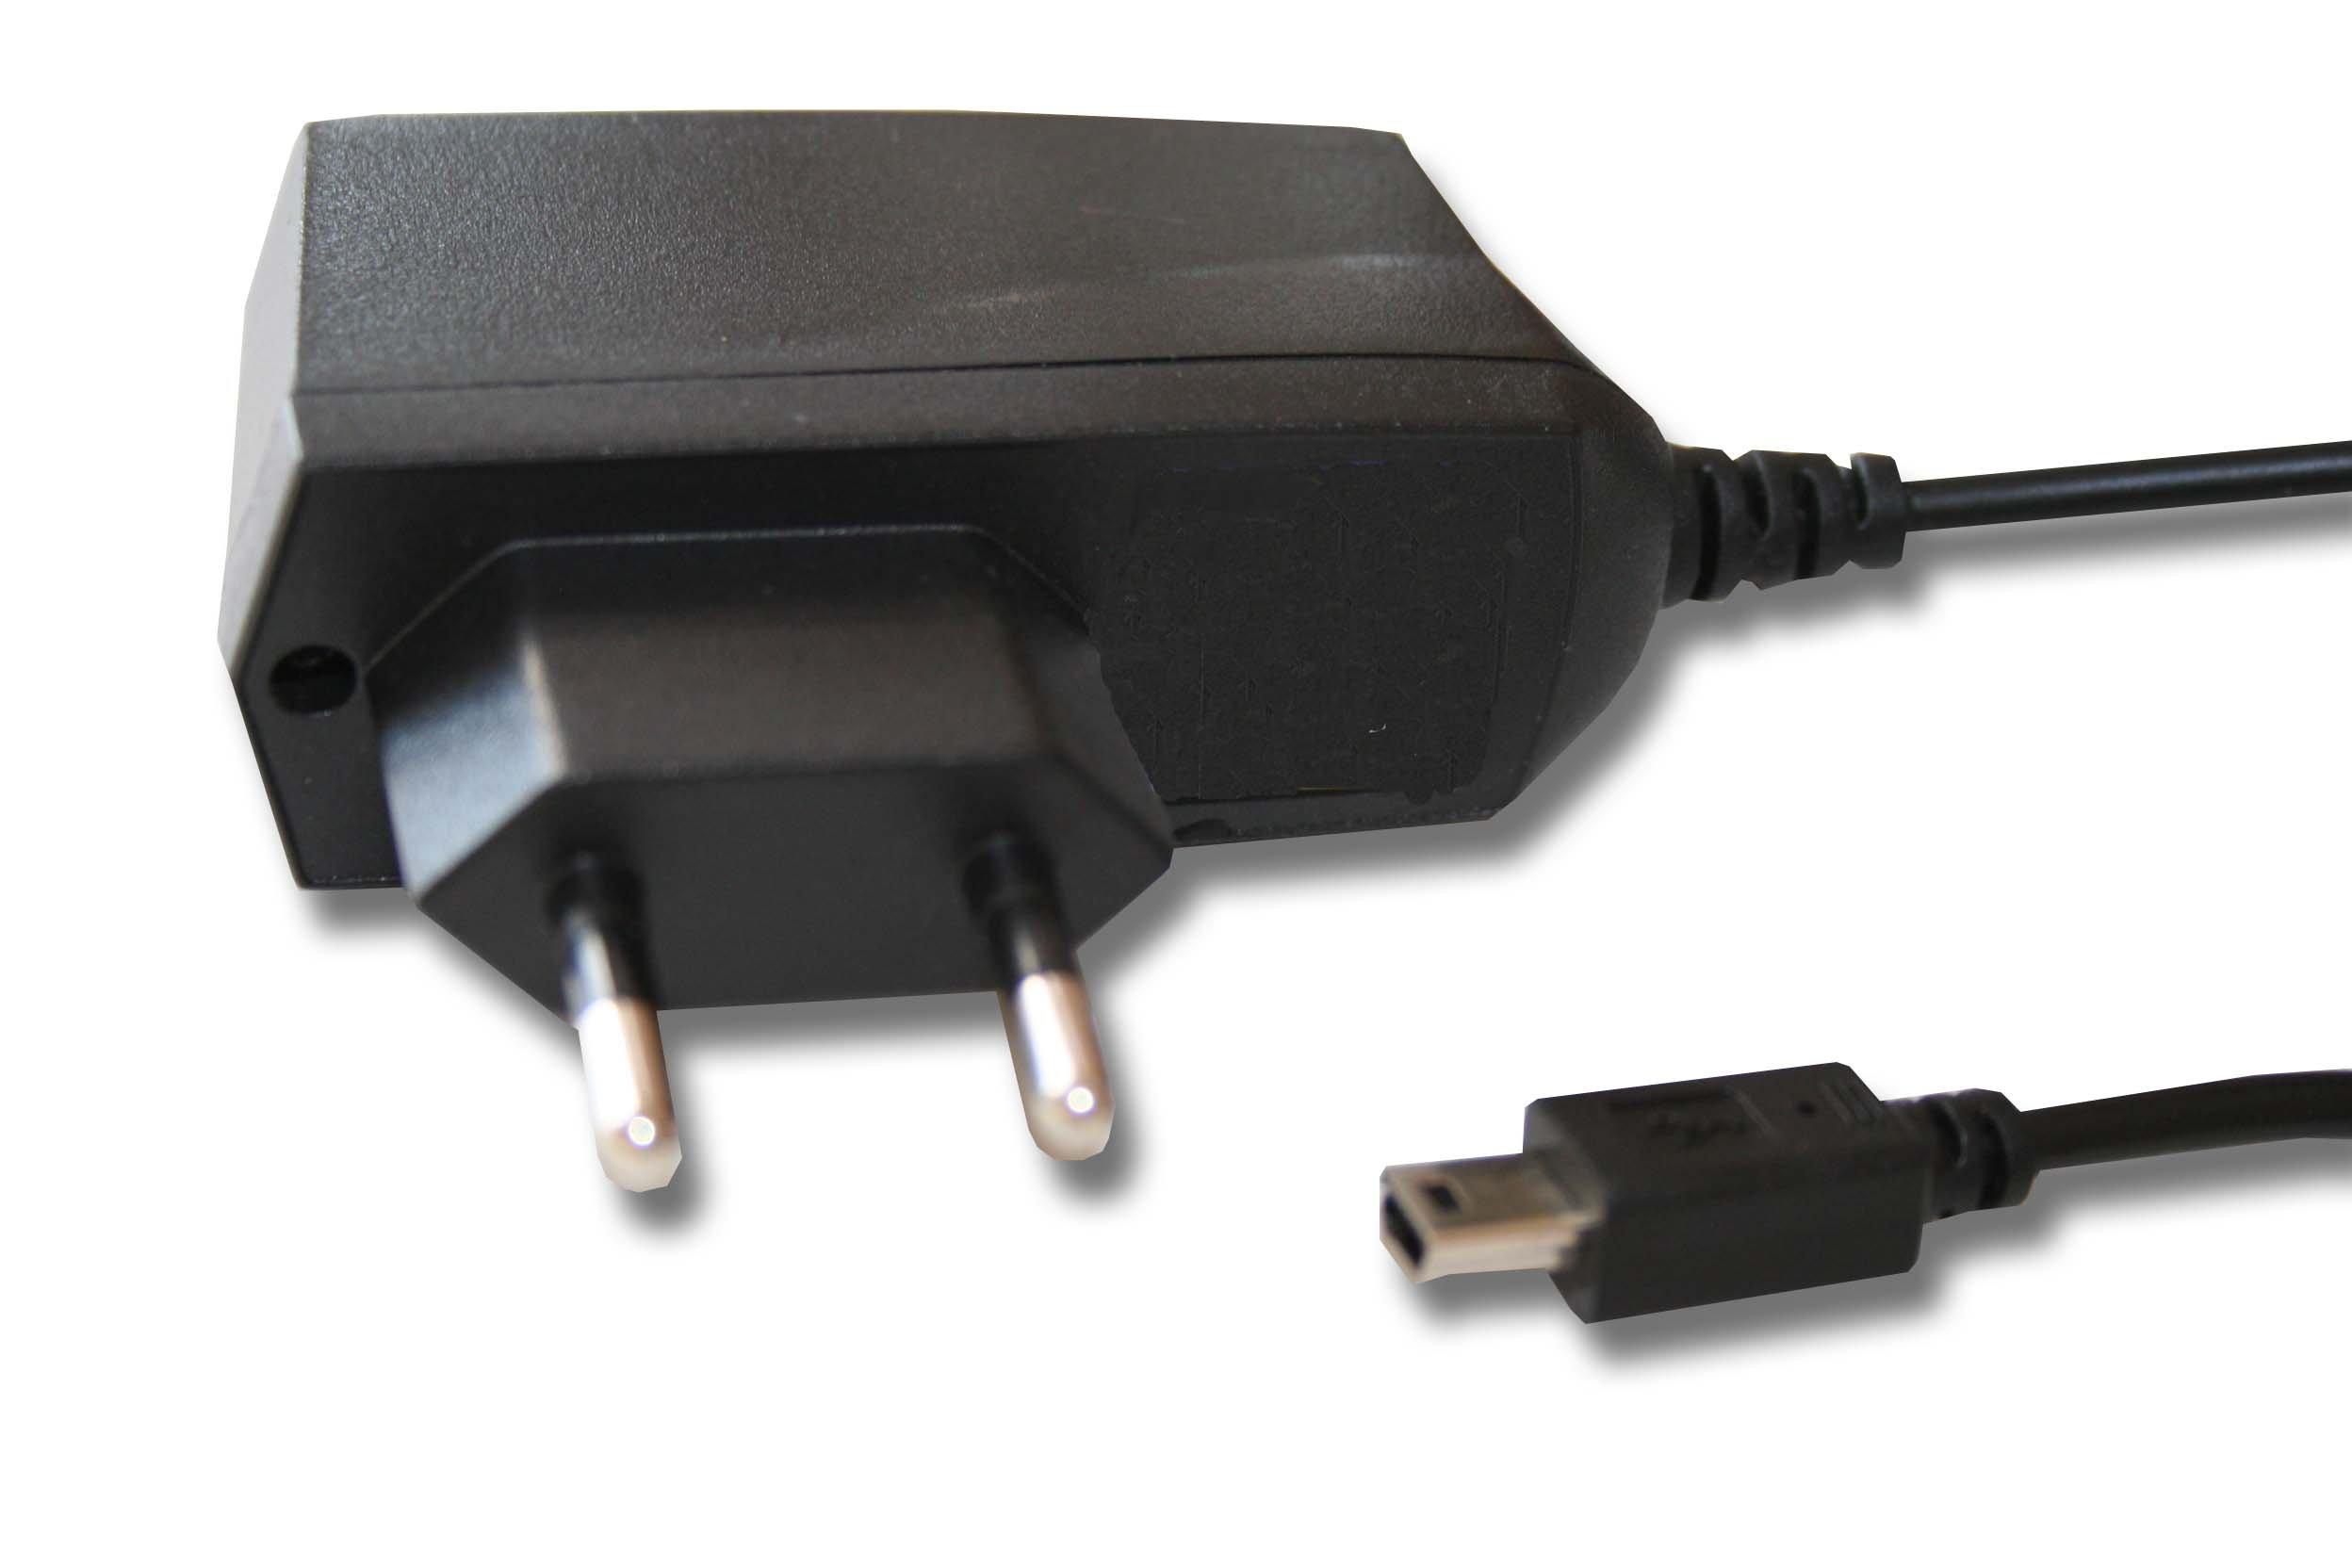 am besten bewertete produkte in der kategorie gps kabel. Black Bedroom Furniture Sets. Home Design Ideas